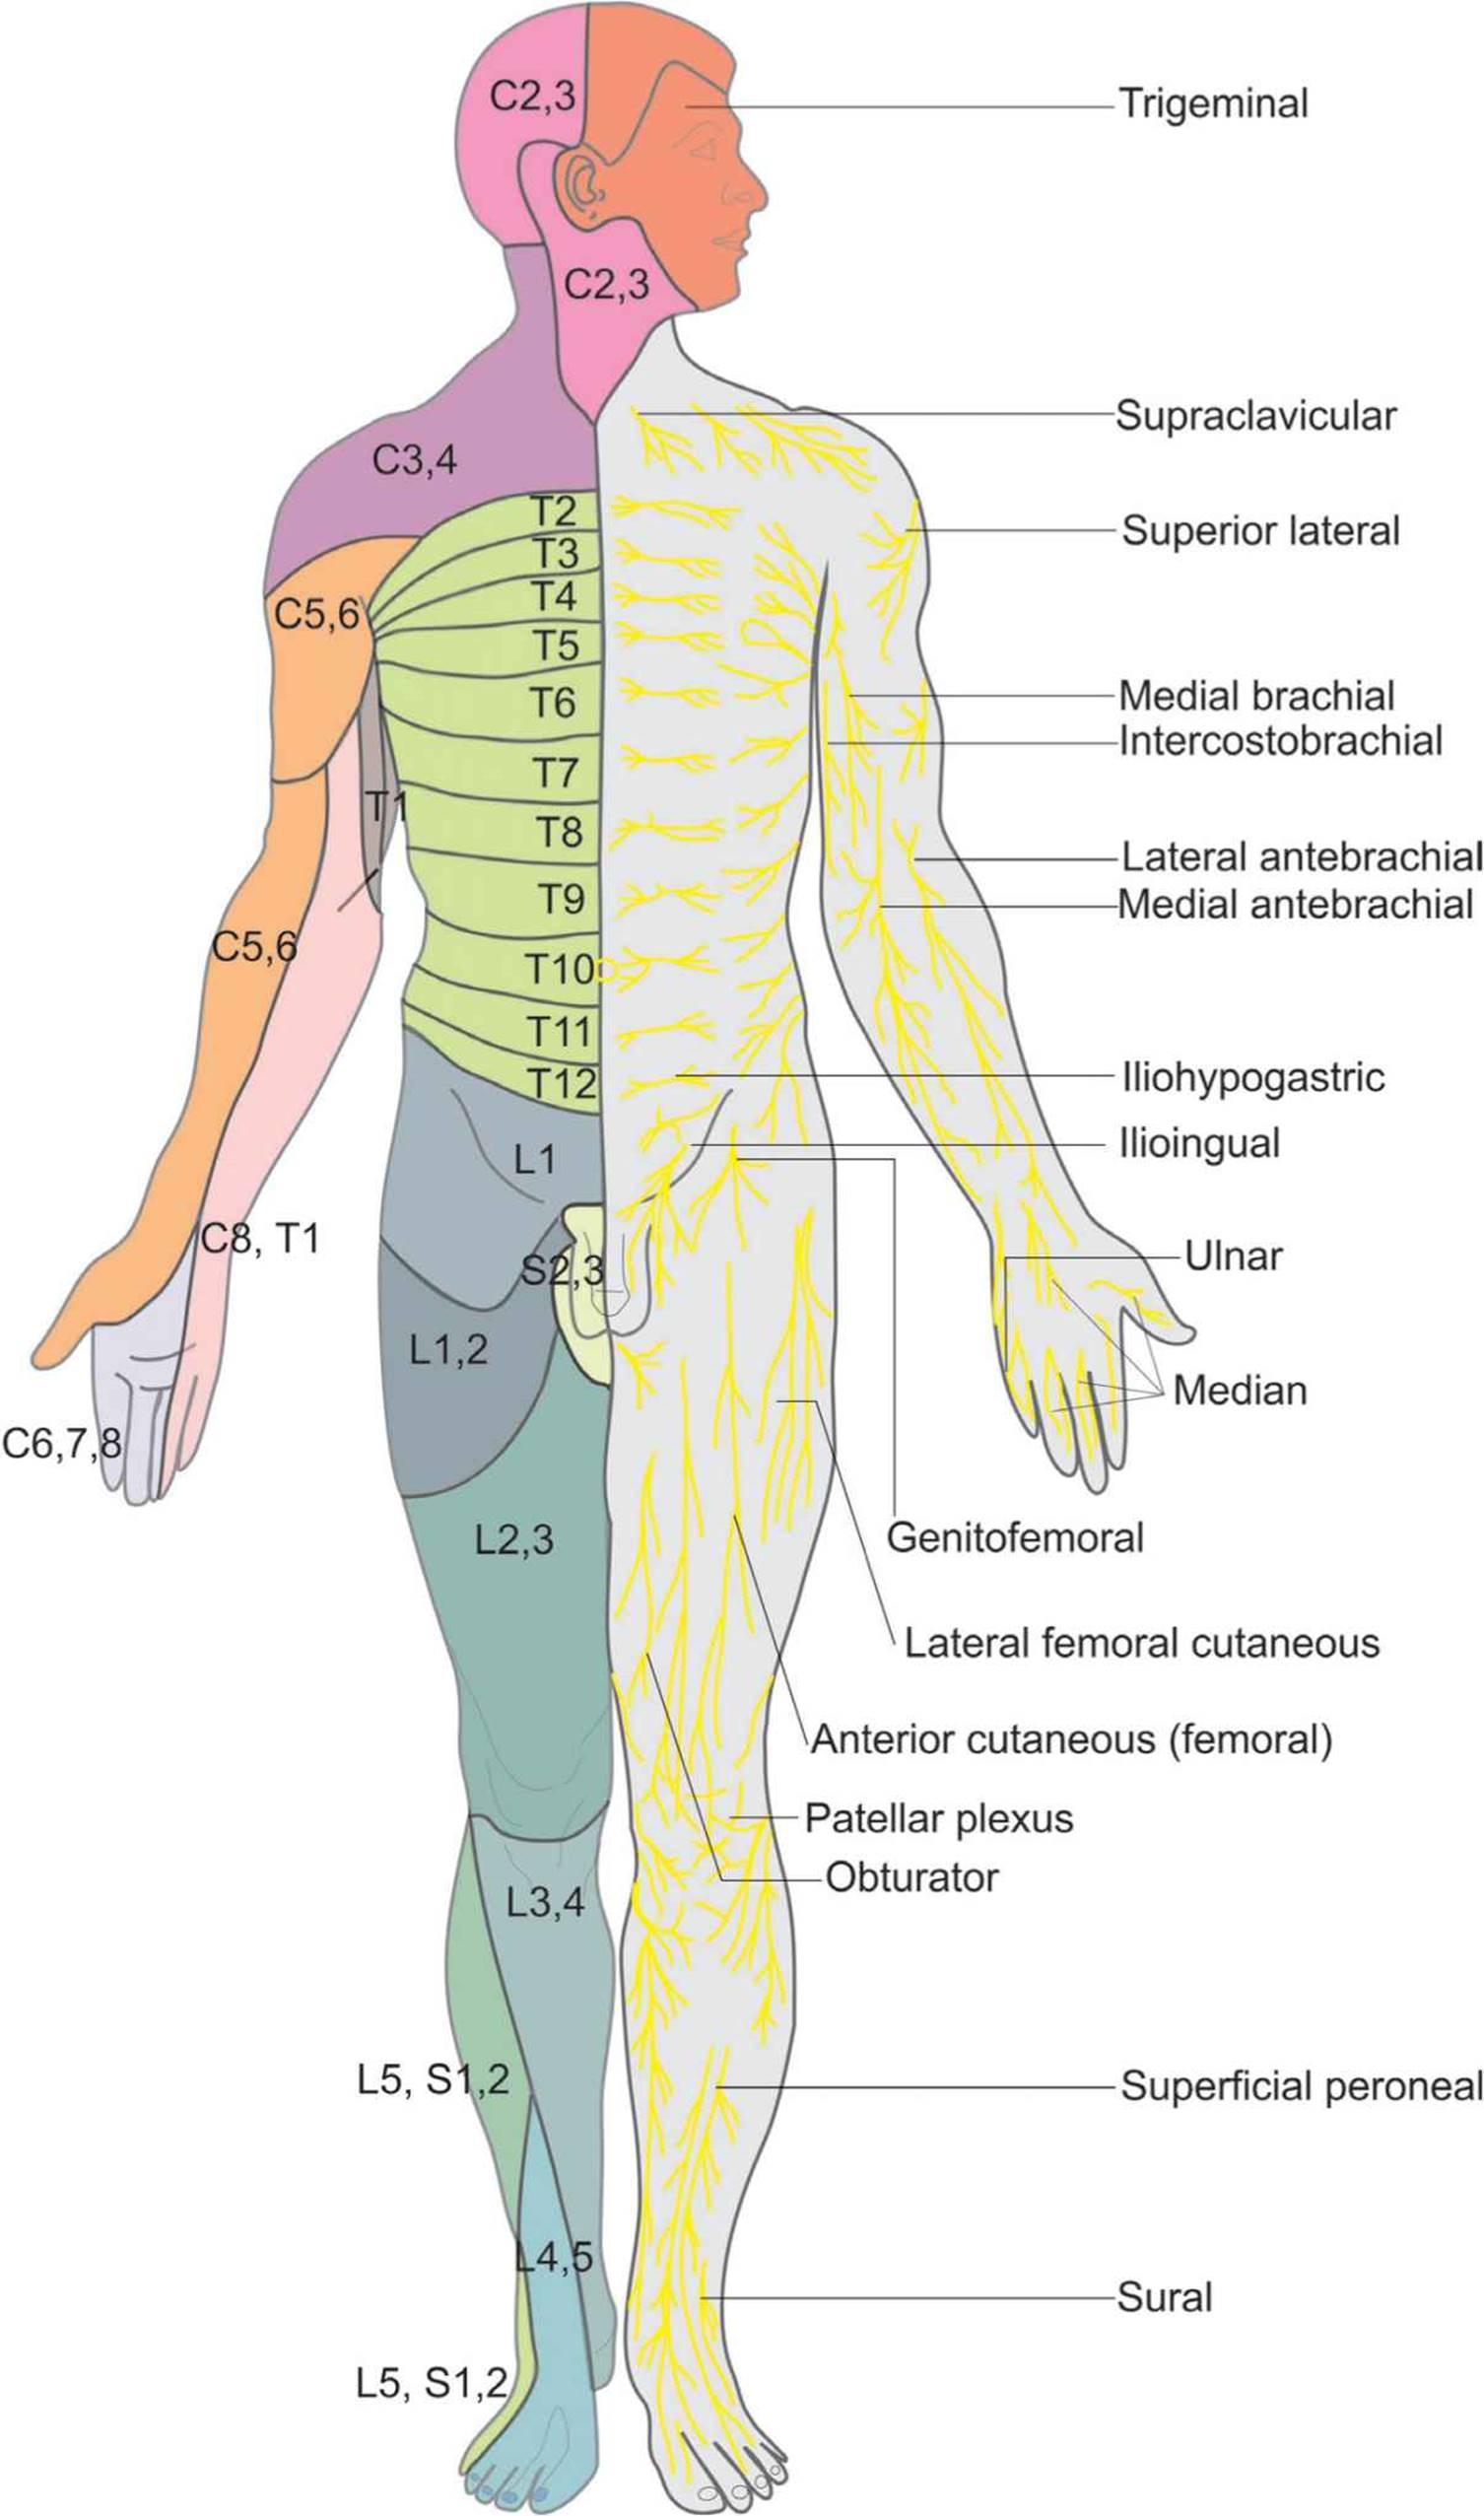 Essential Regional Anesthesia Anatomy Hadzics Peripheral Nerve